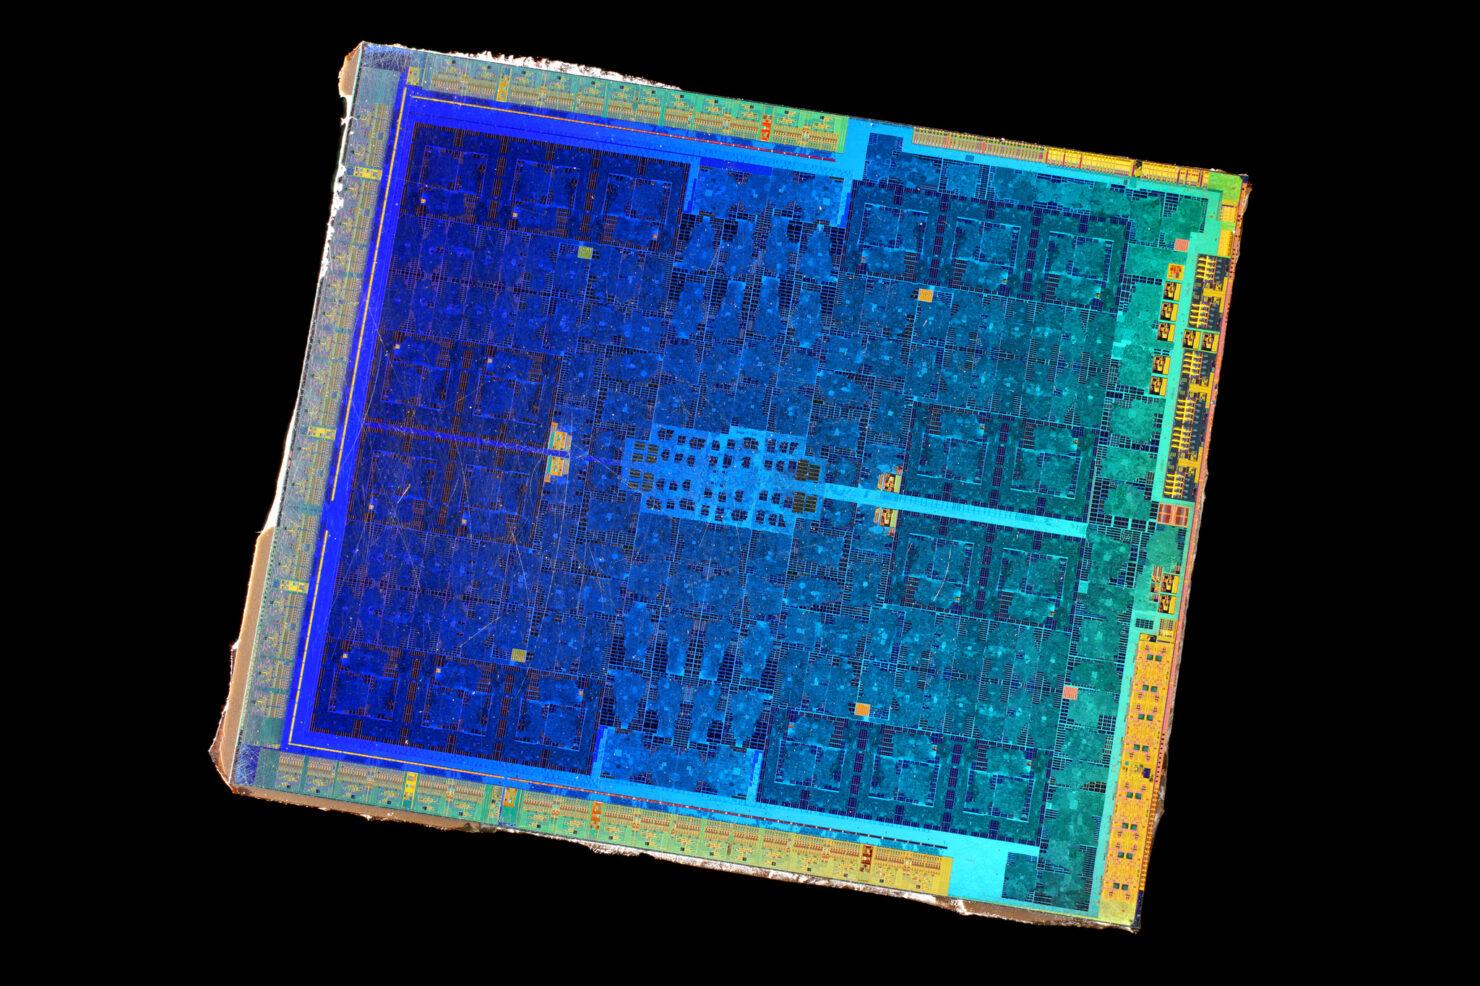 nvidia-gp104-gpu-3